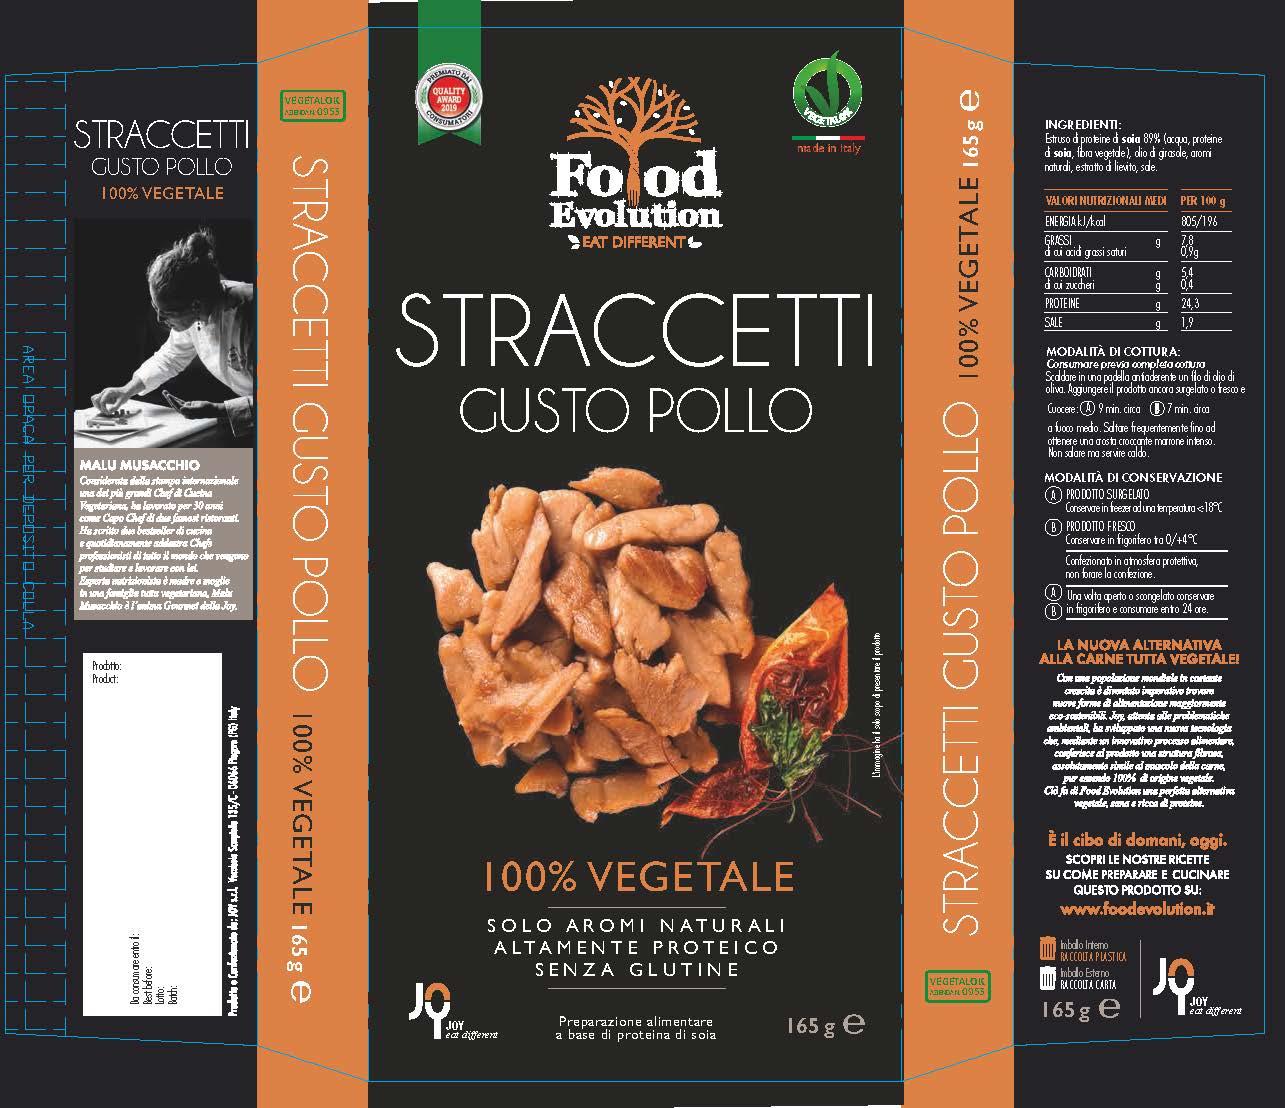 FASCIA Pack Straccetti 165 g VARIANTE LOGHI  veg ok  award 1jpg